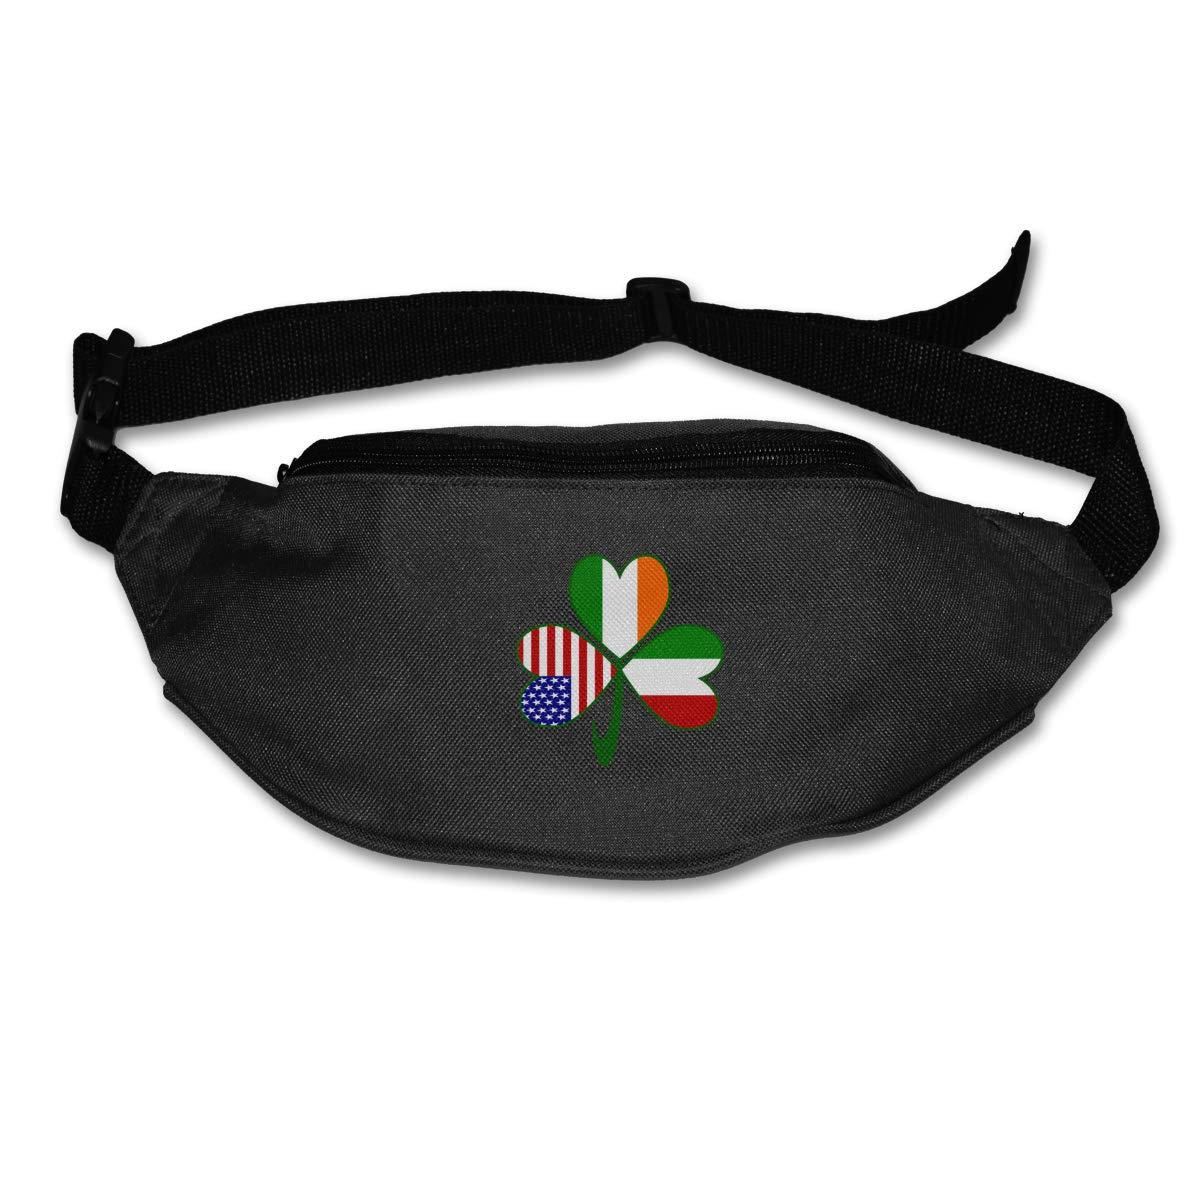 Italian Irish American Shamrock Sport Waist Bag Fanny Pack Adjustable For Hike